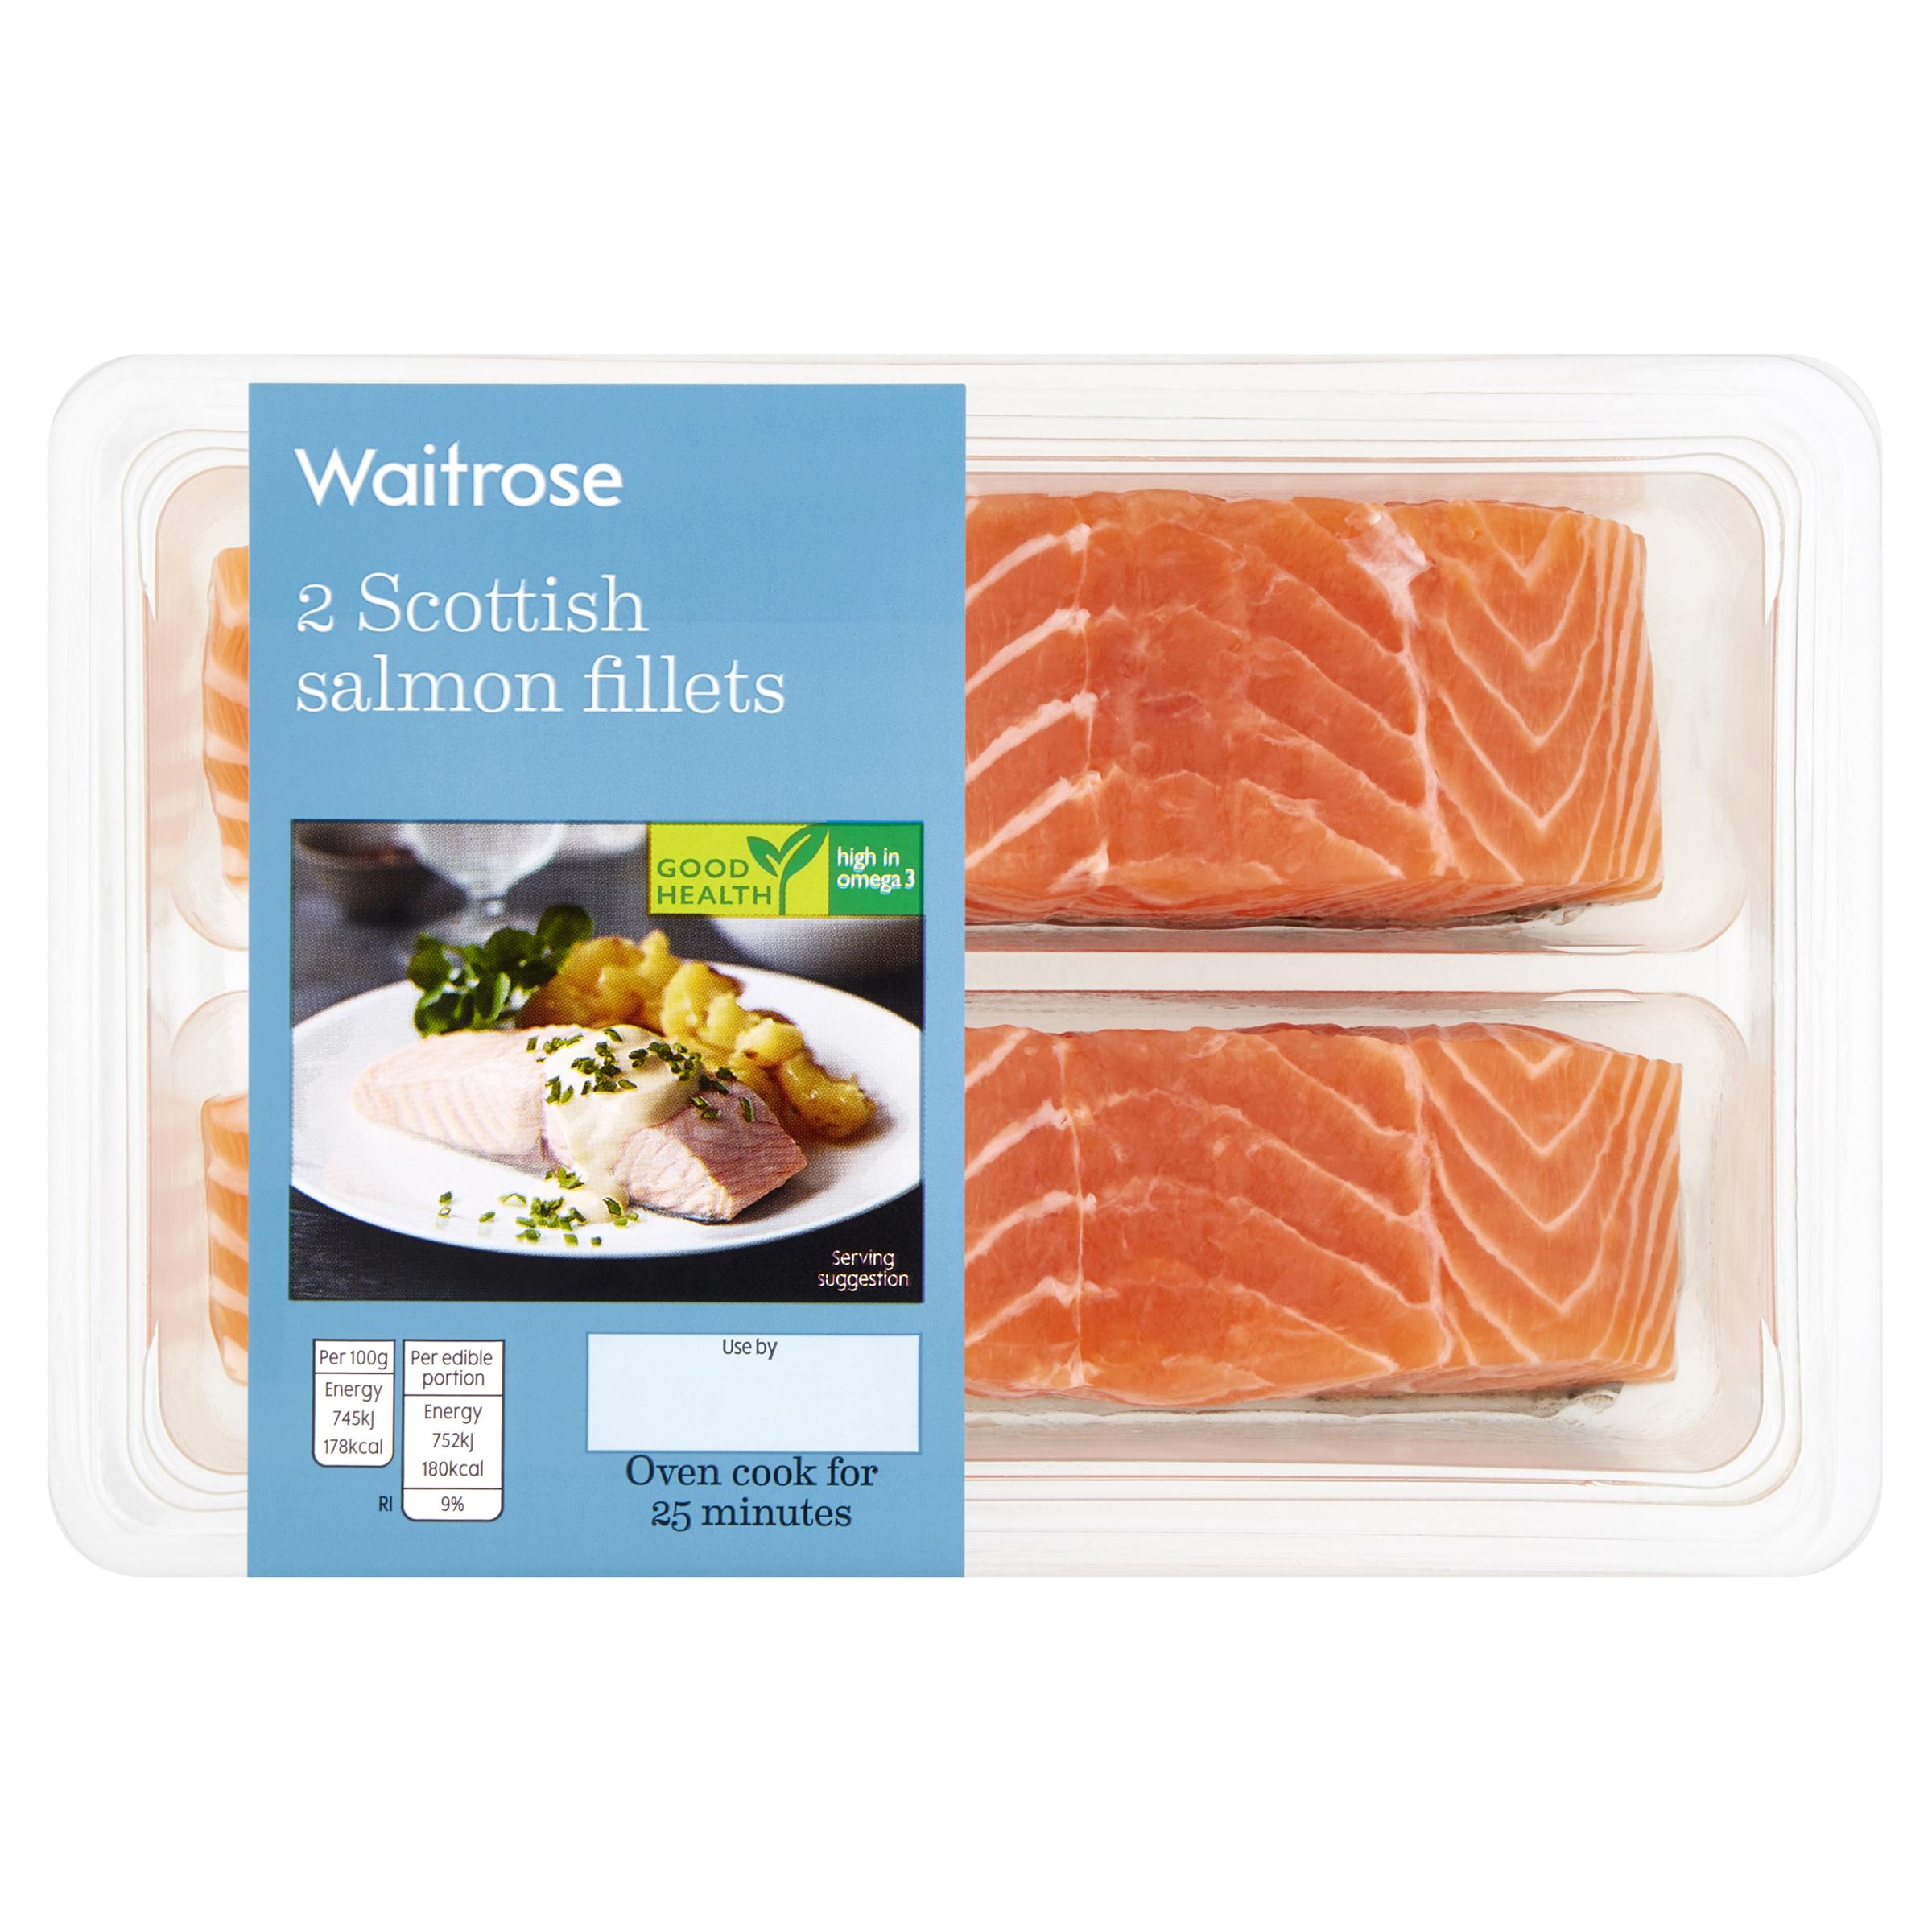 2 Scottish Salmon Fillets